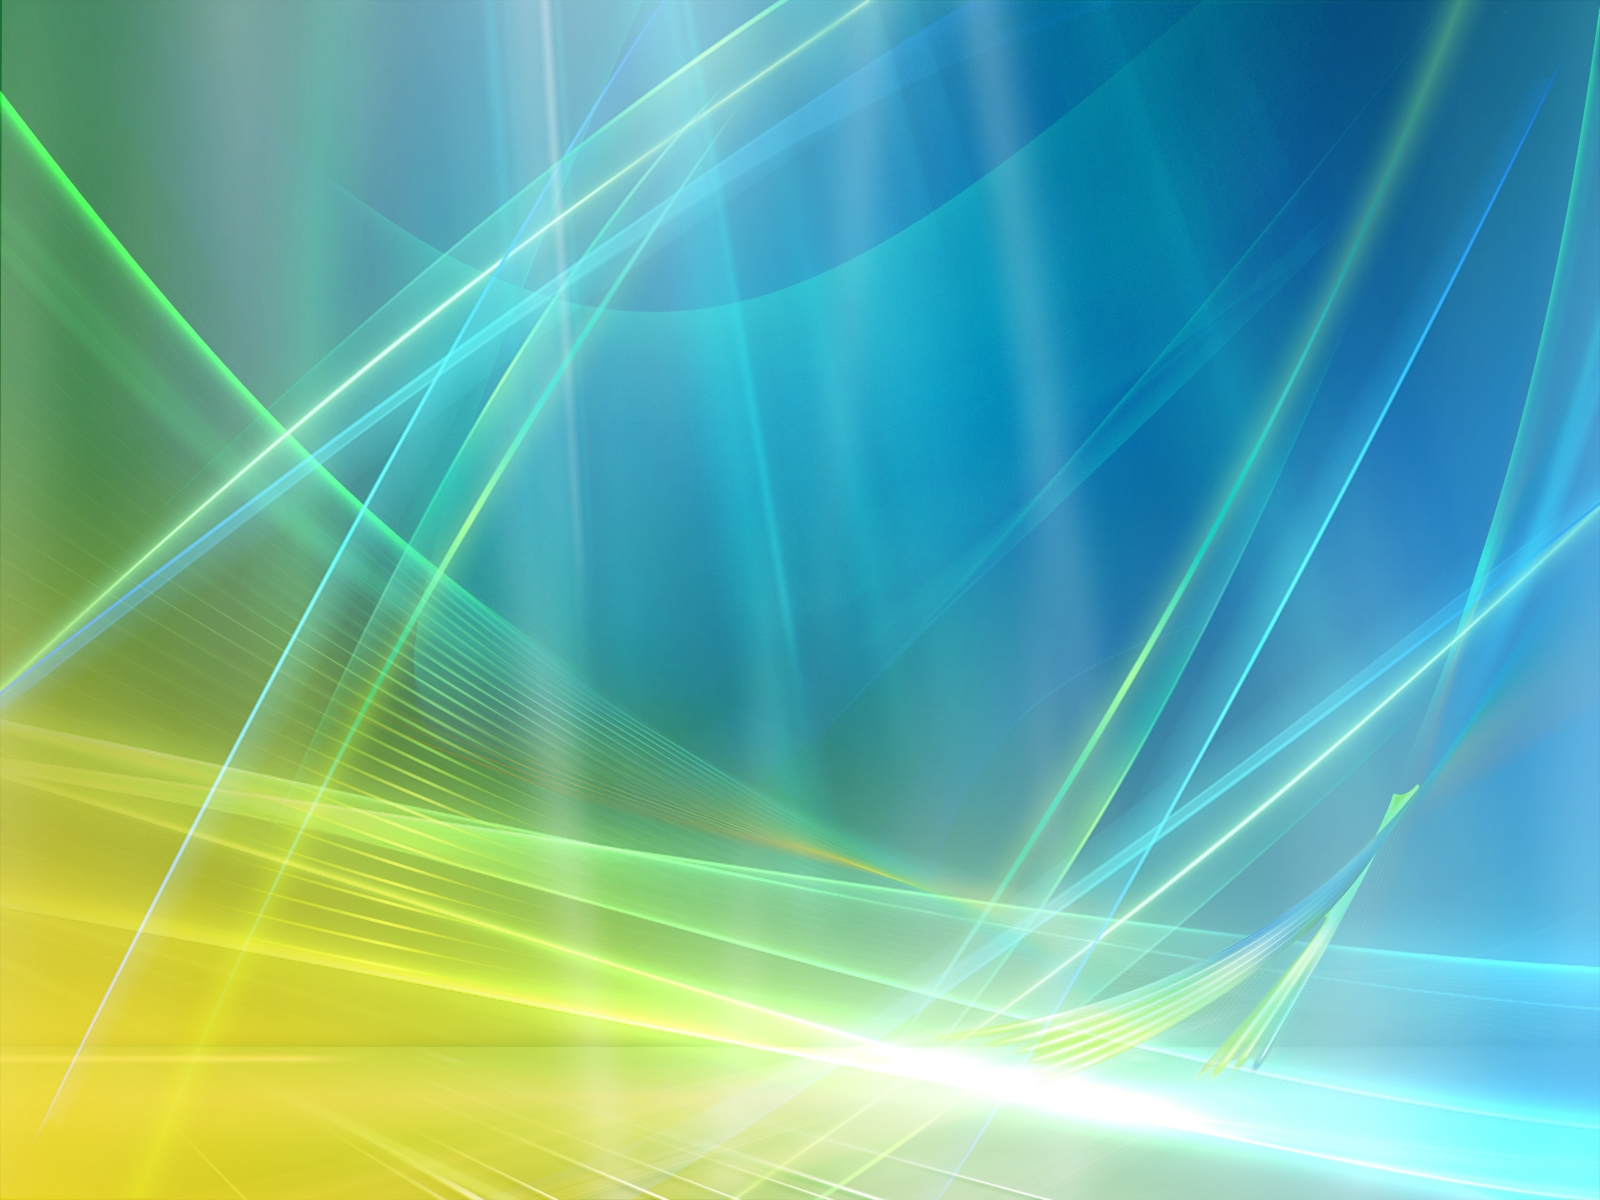 Vista Graphics Wallpapers HD Wallpapers 1600x1200